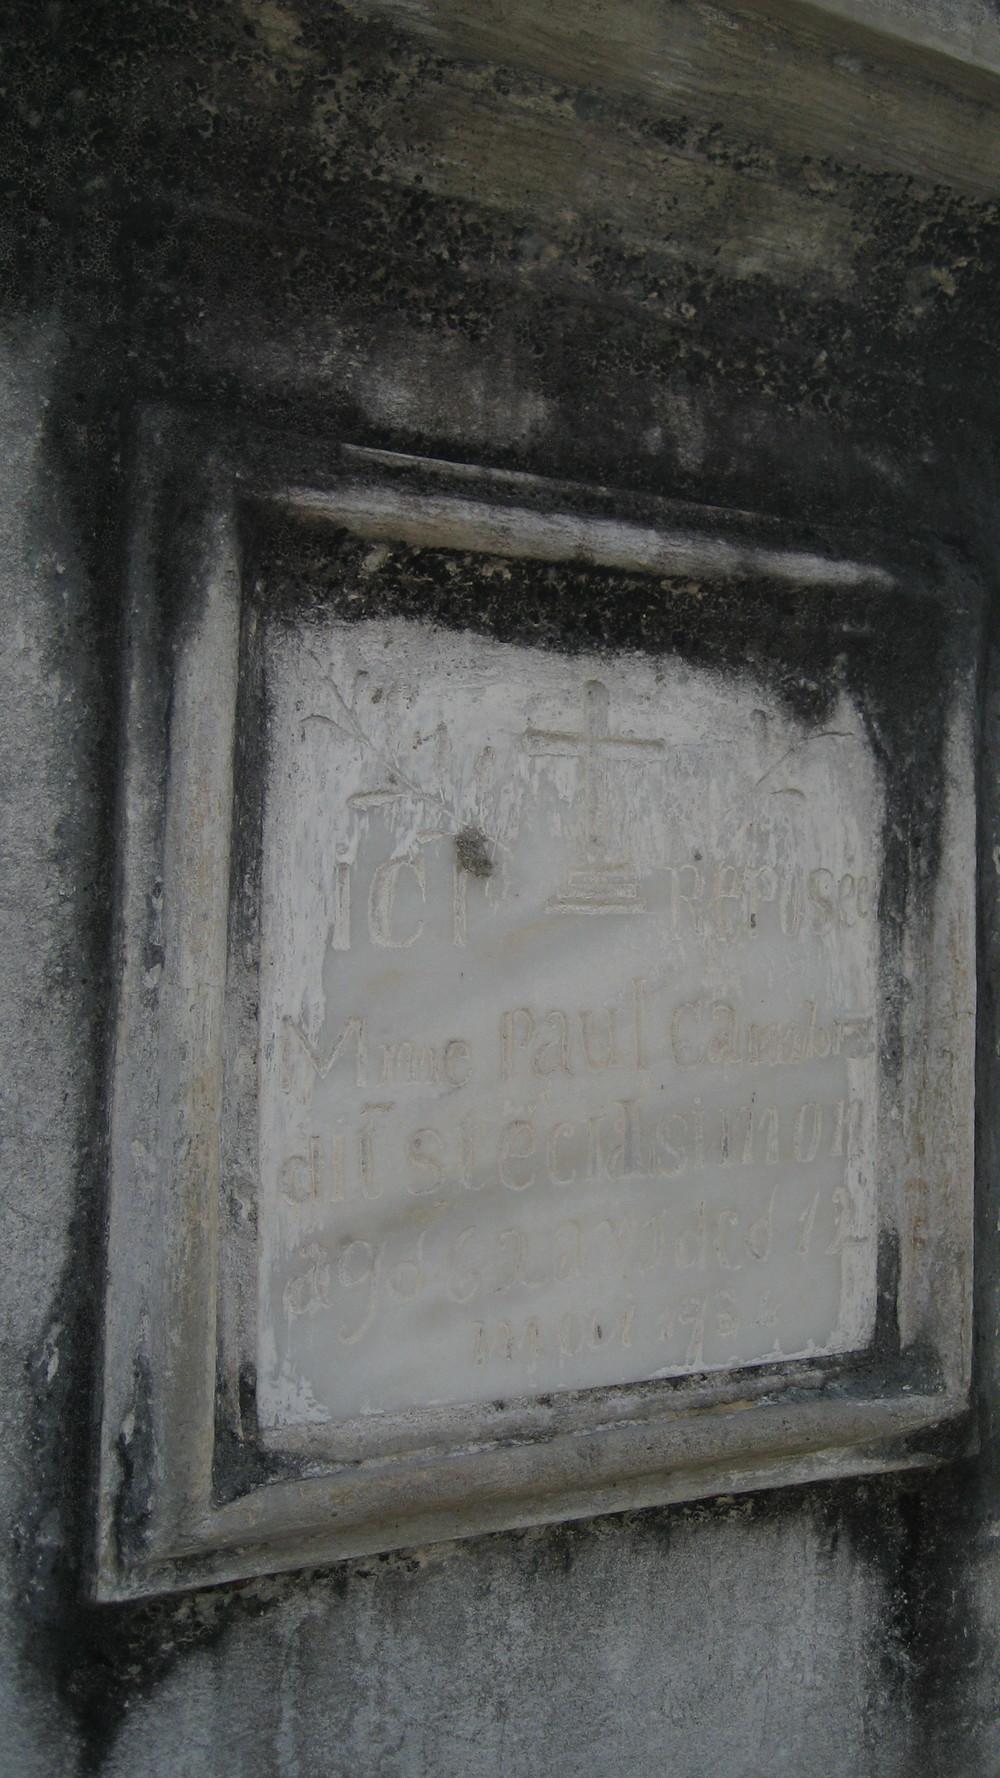 IMG_1762.JPG